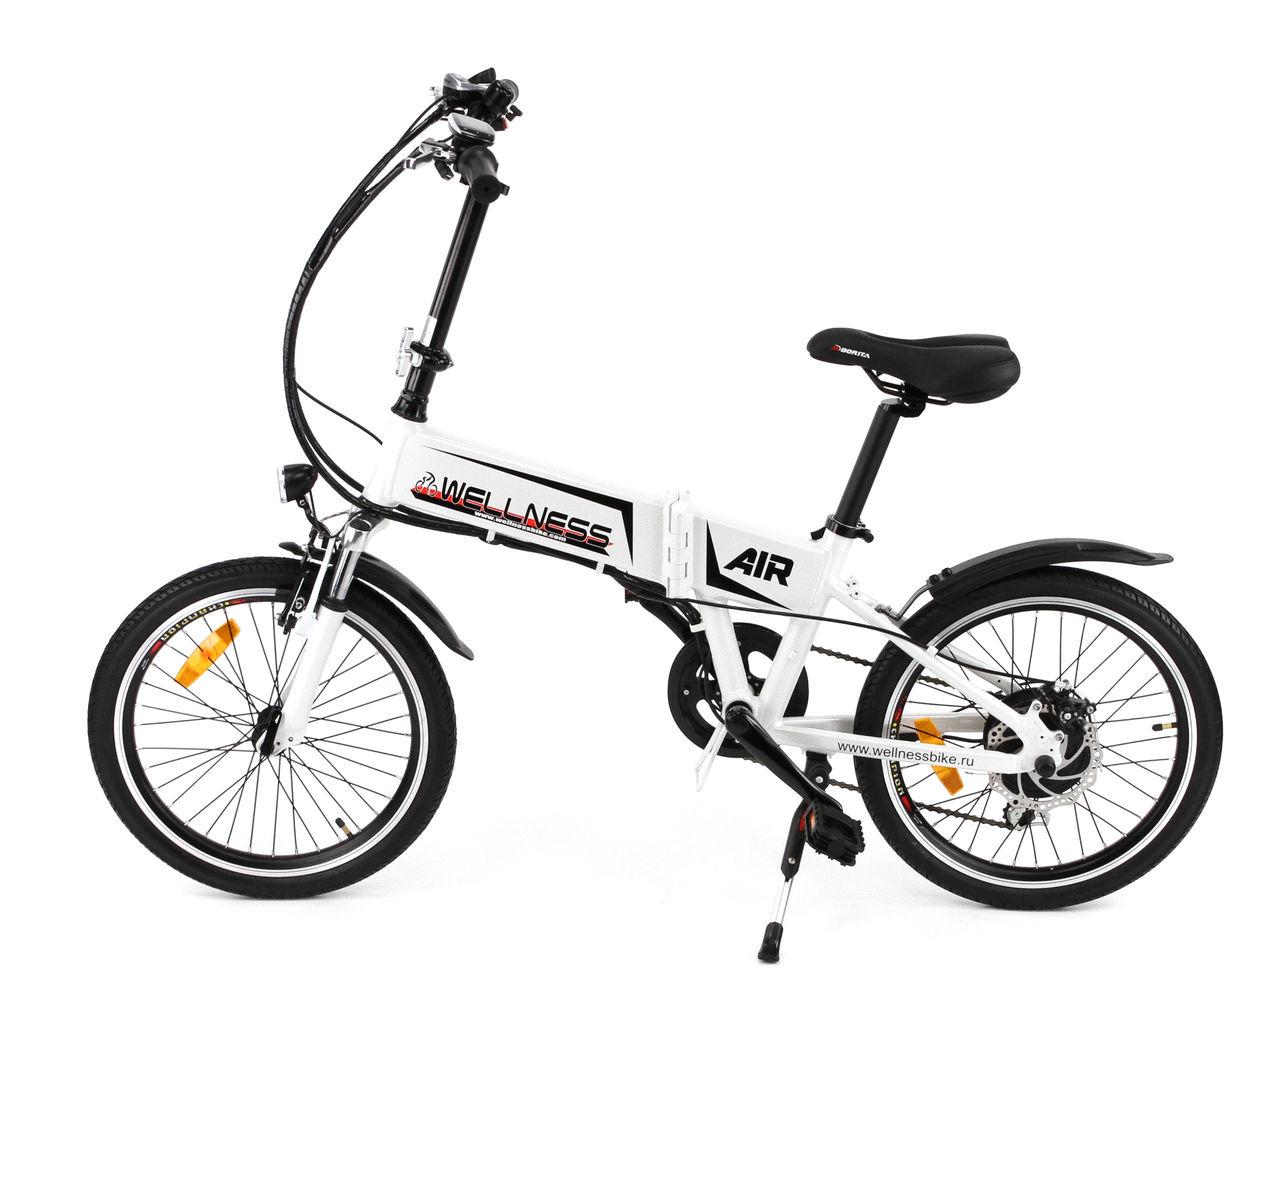 Электровелосипед WELLNESS Air 350-4